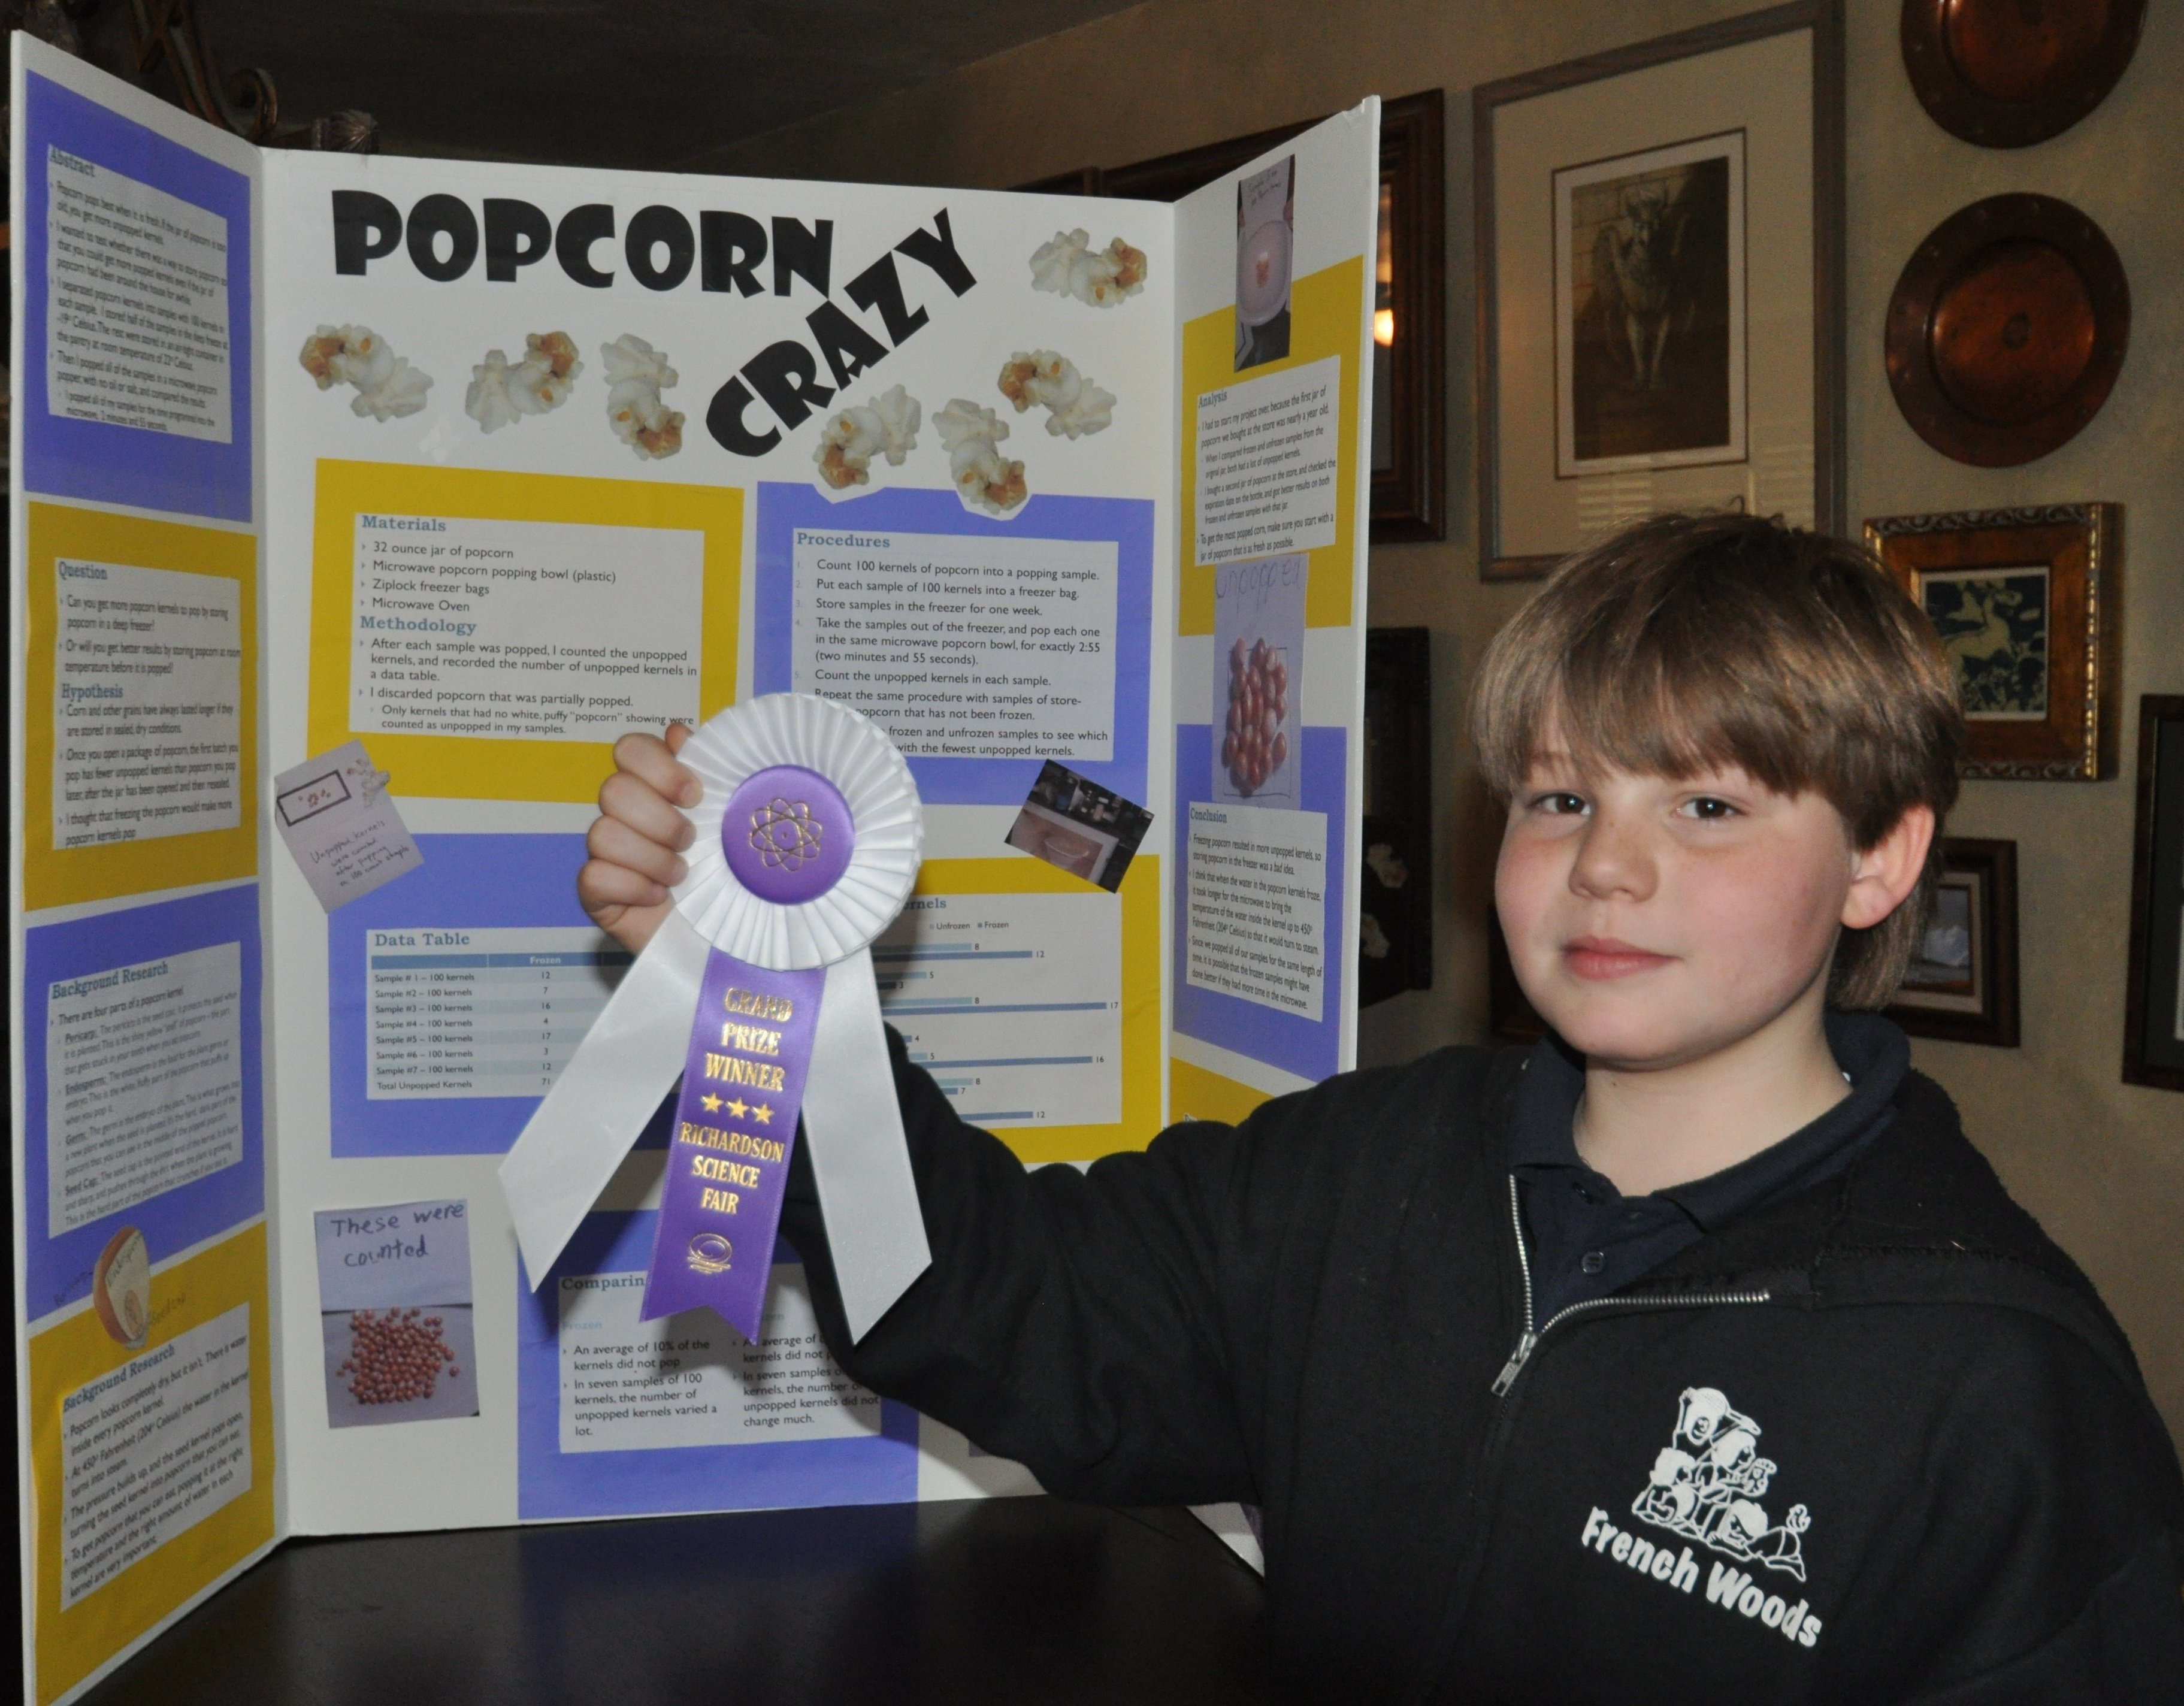 10 Lovely Science Fair Ideas 6Th Grade how to help your kid win a science fair marketing where technology 16 2020